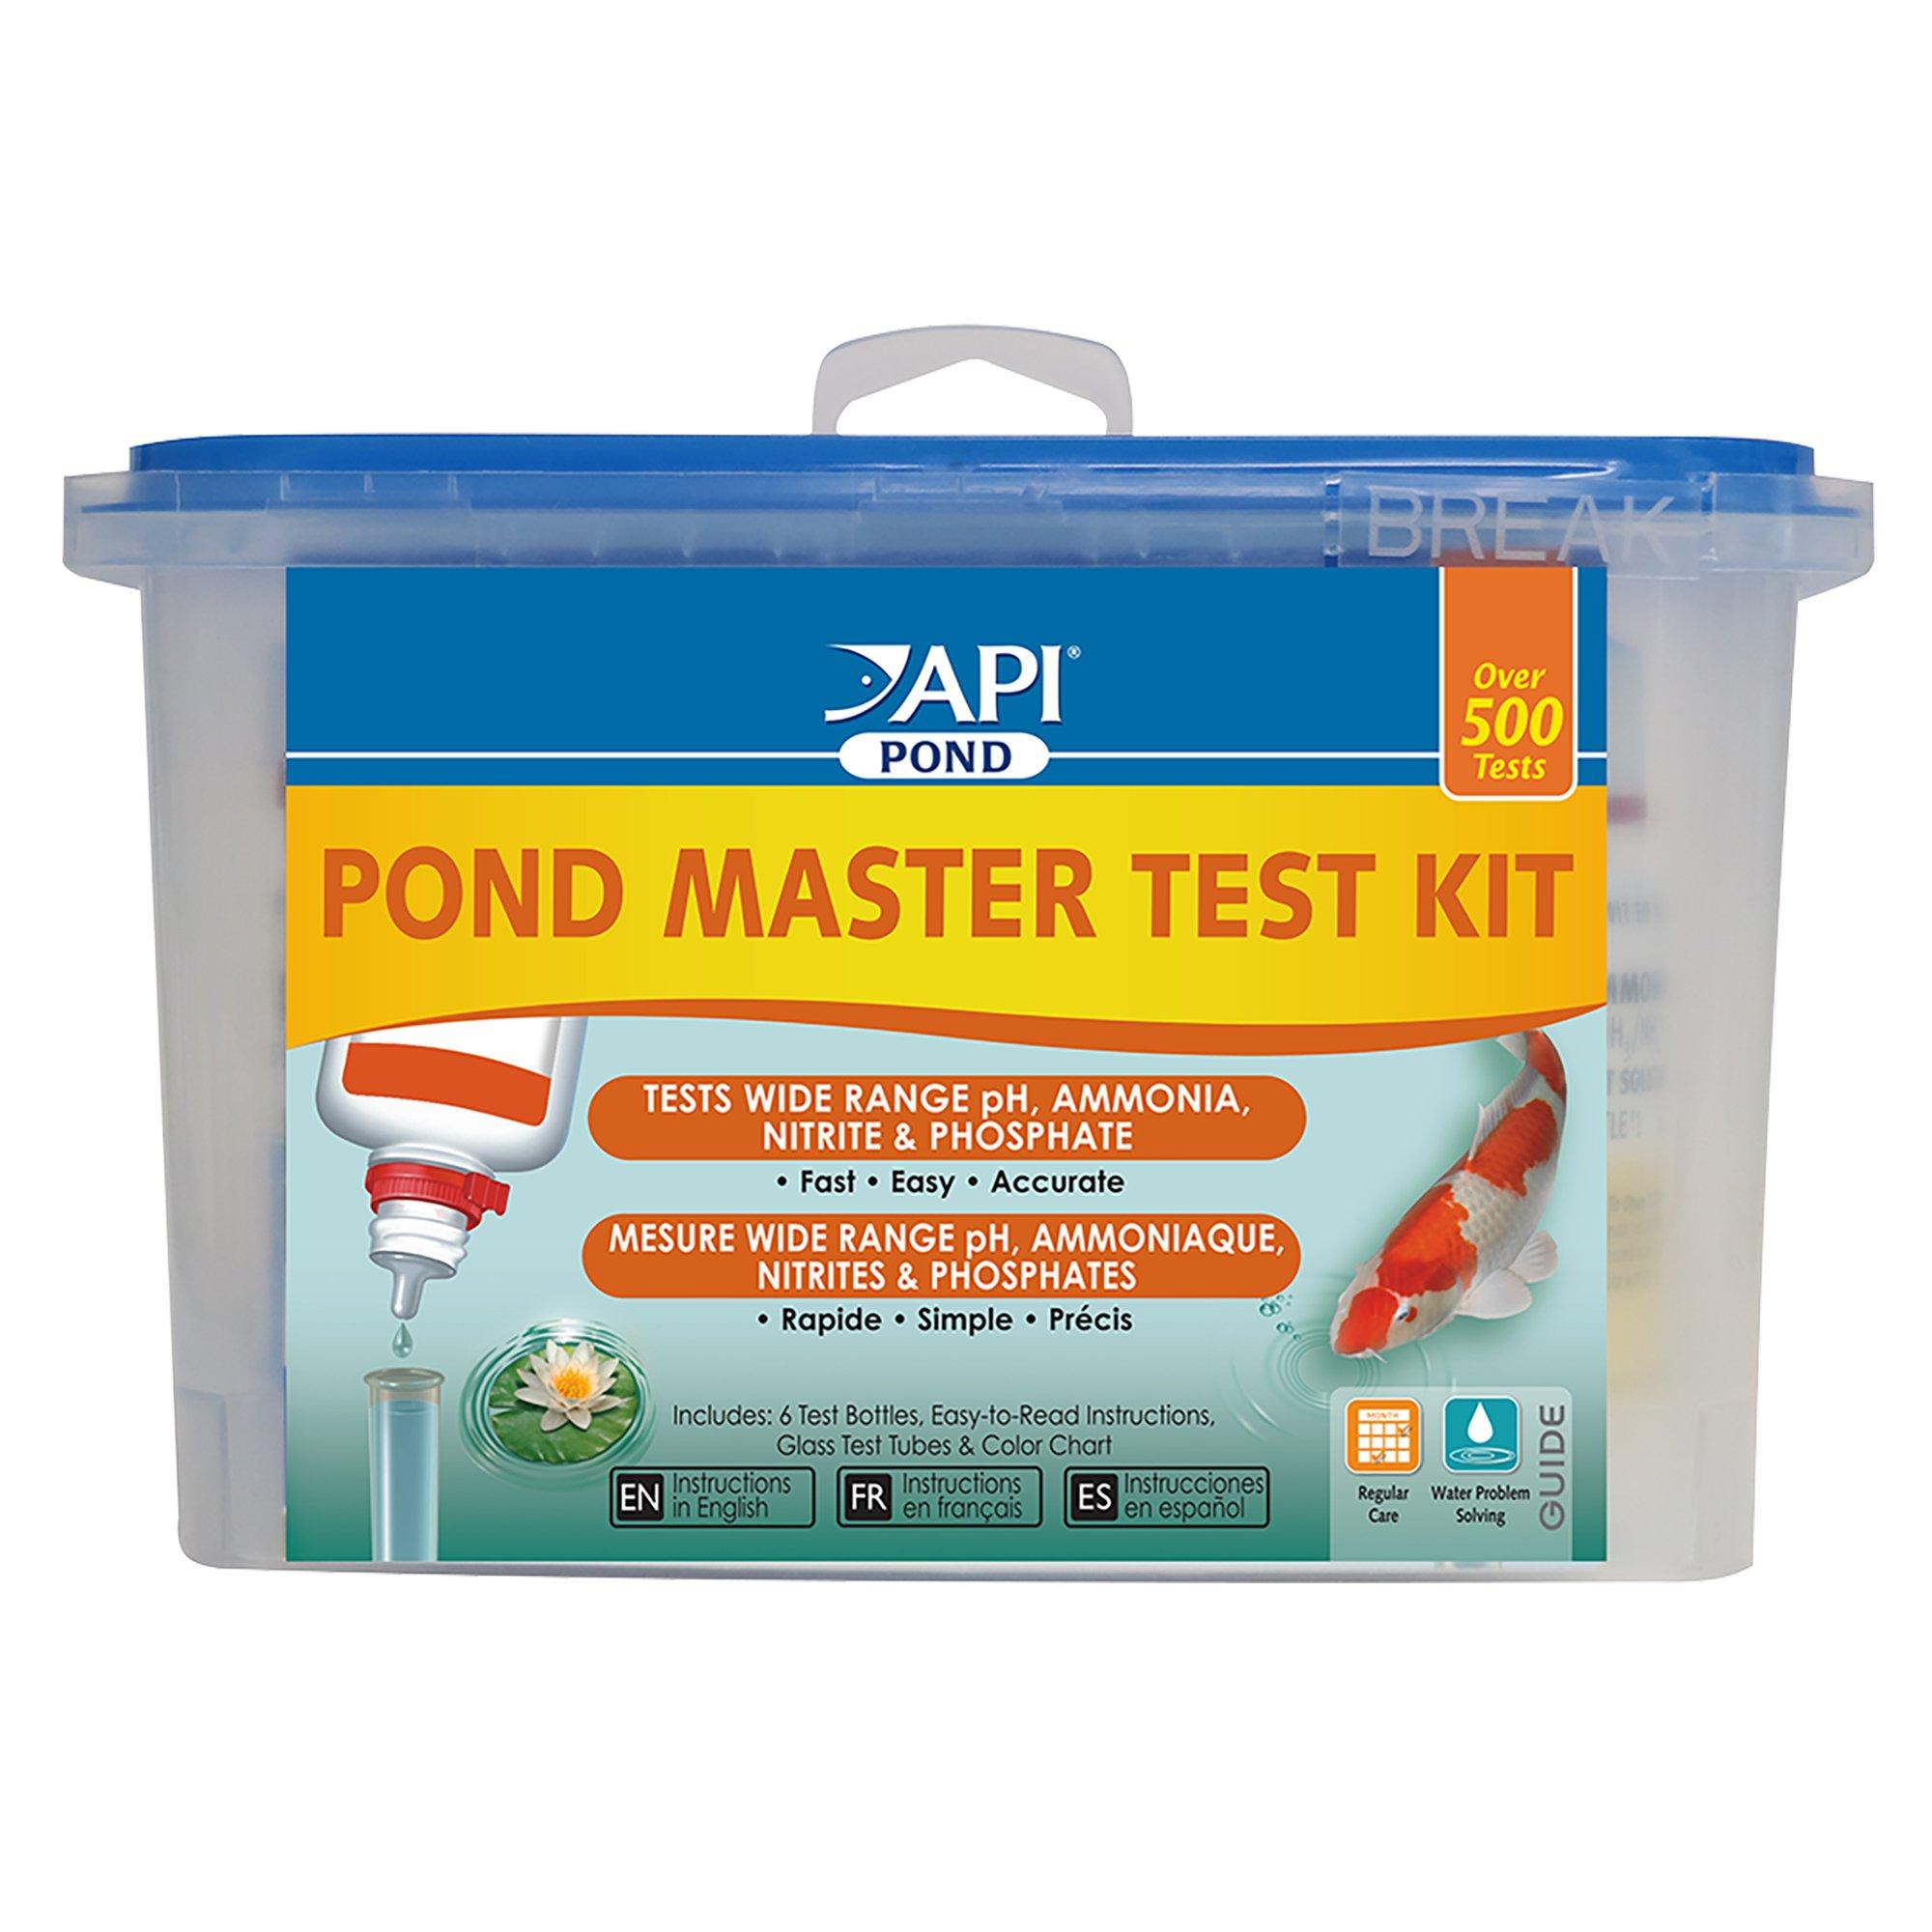 PondCare Master Liquid Test Kit (6 Bottle Kit) by Pondcare, MARS Pondcare